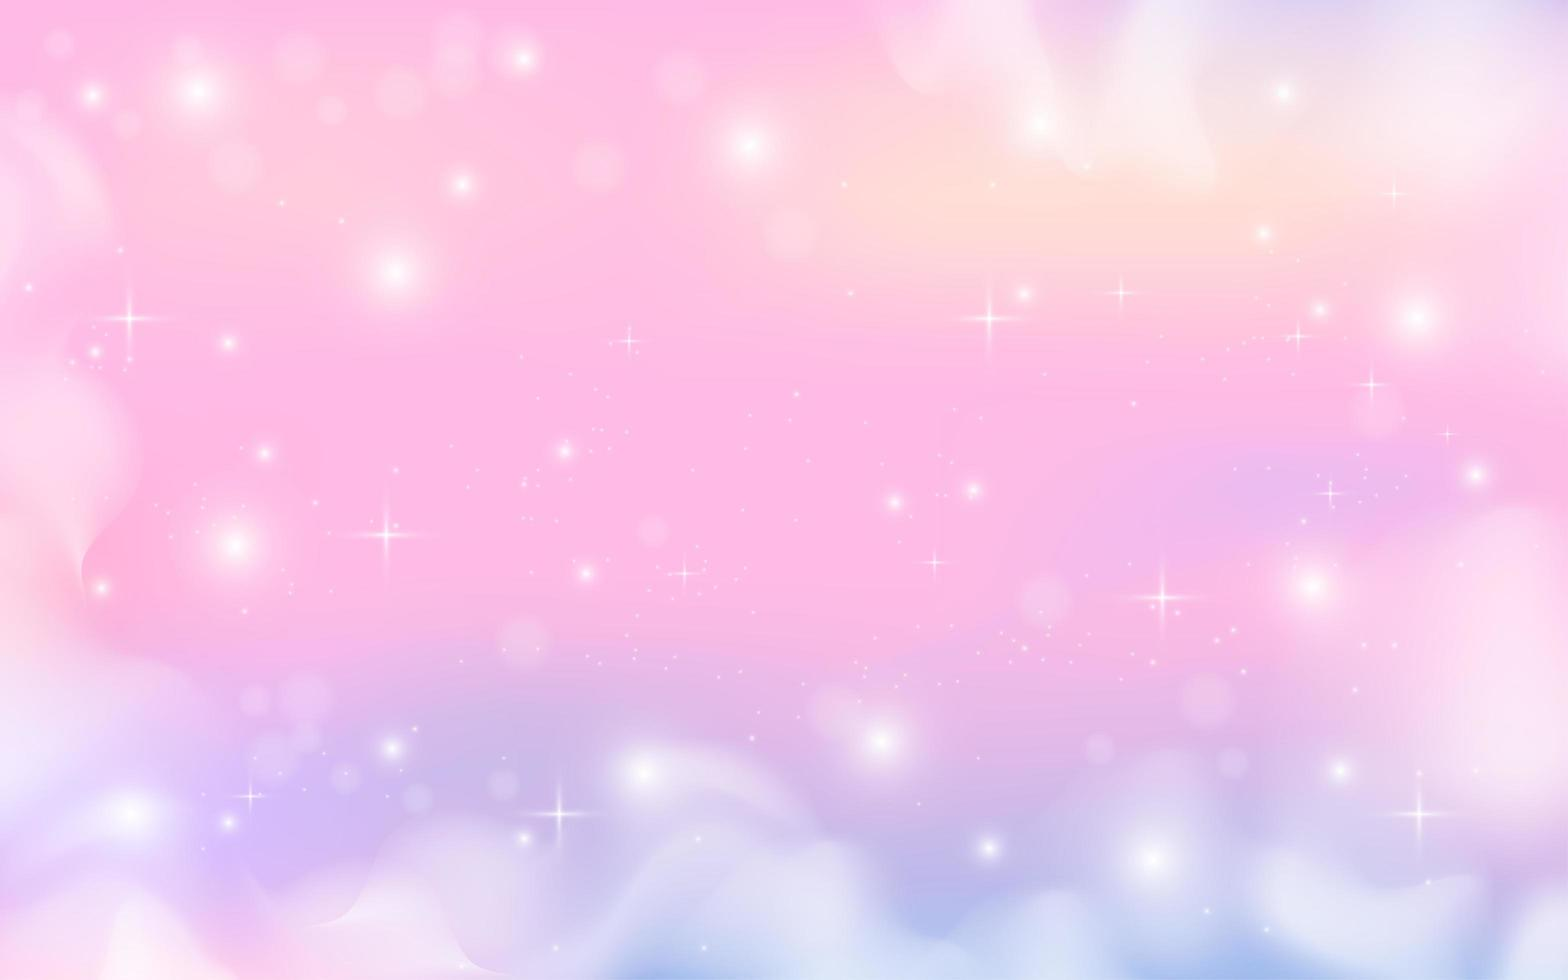 pastelkleur fantasie melkwegontwerp vector